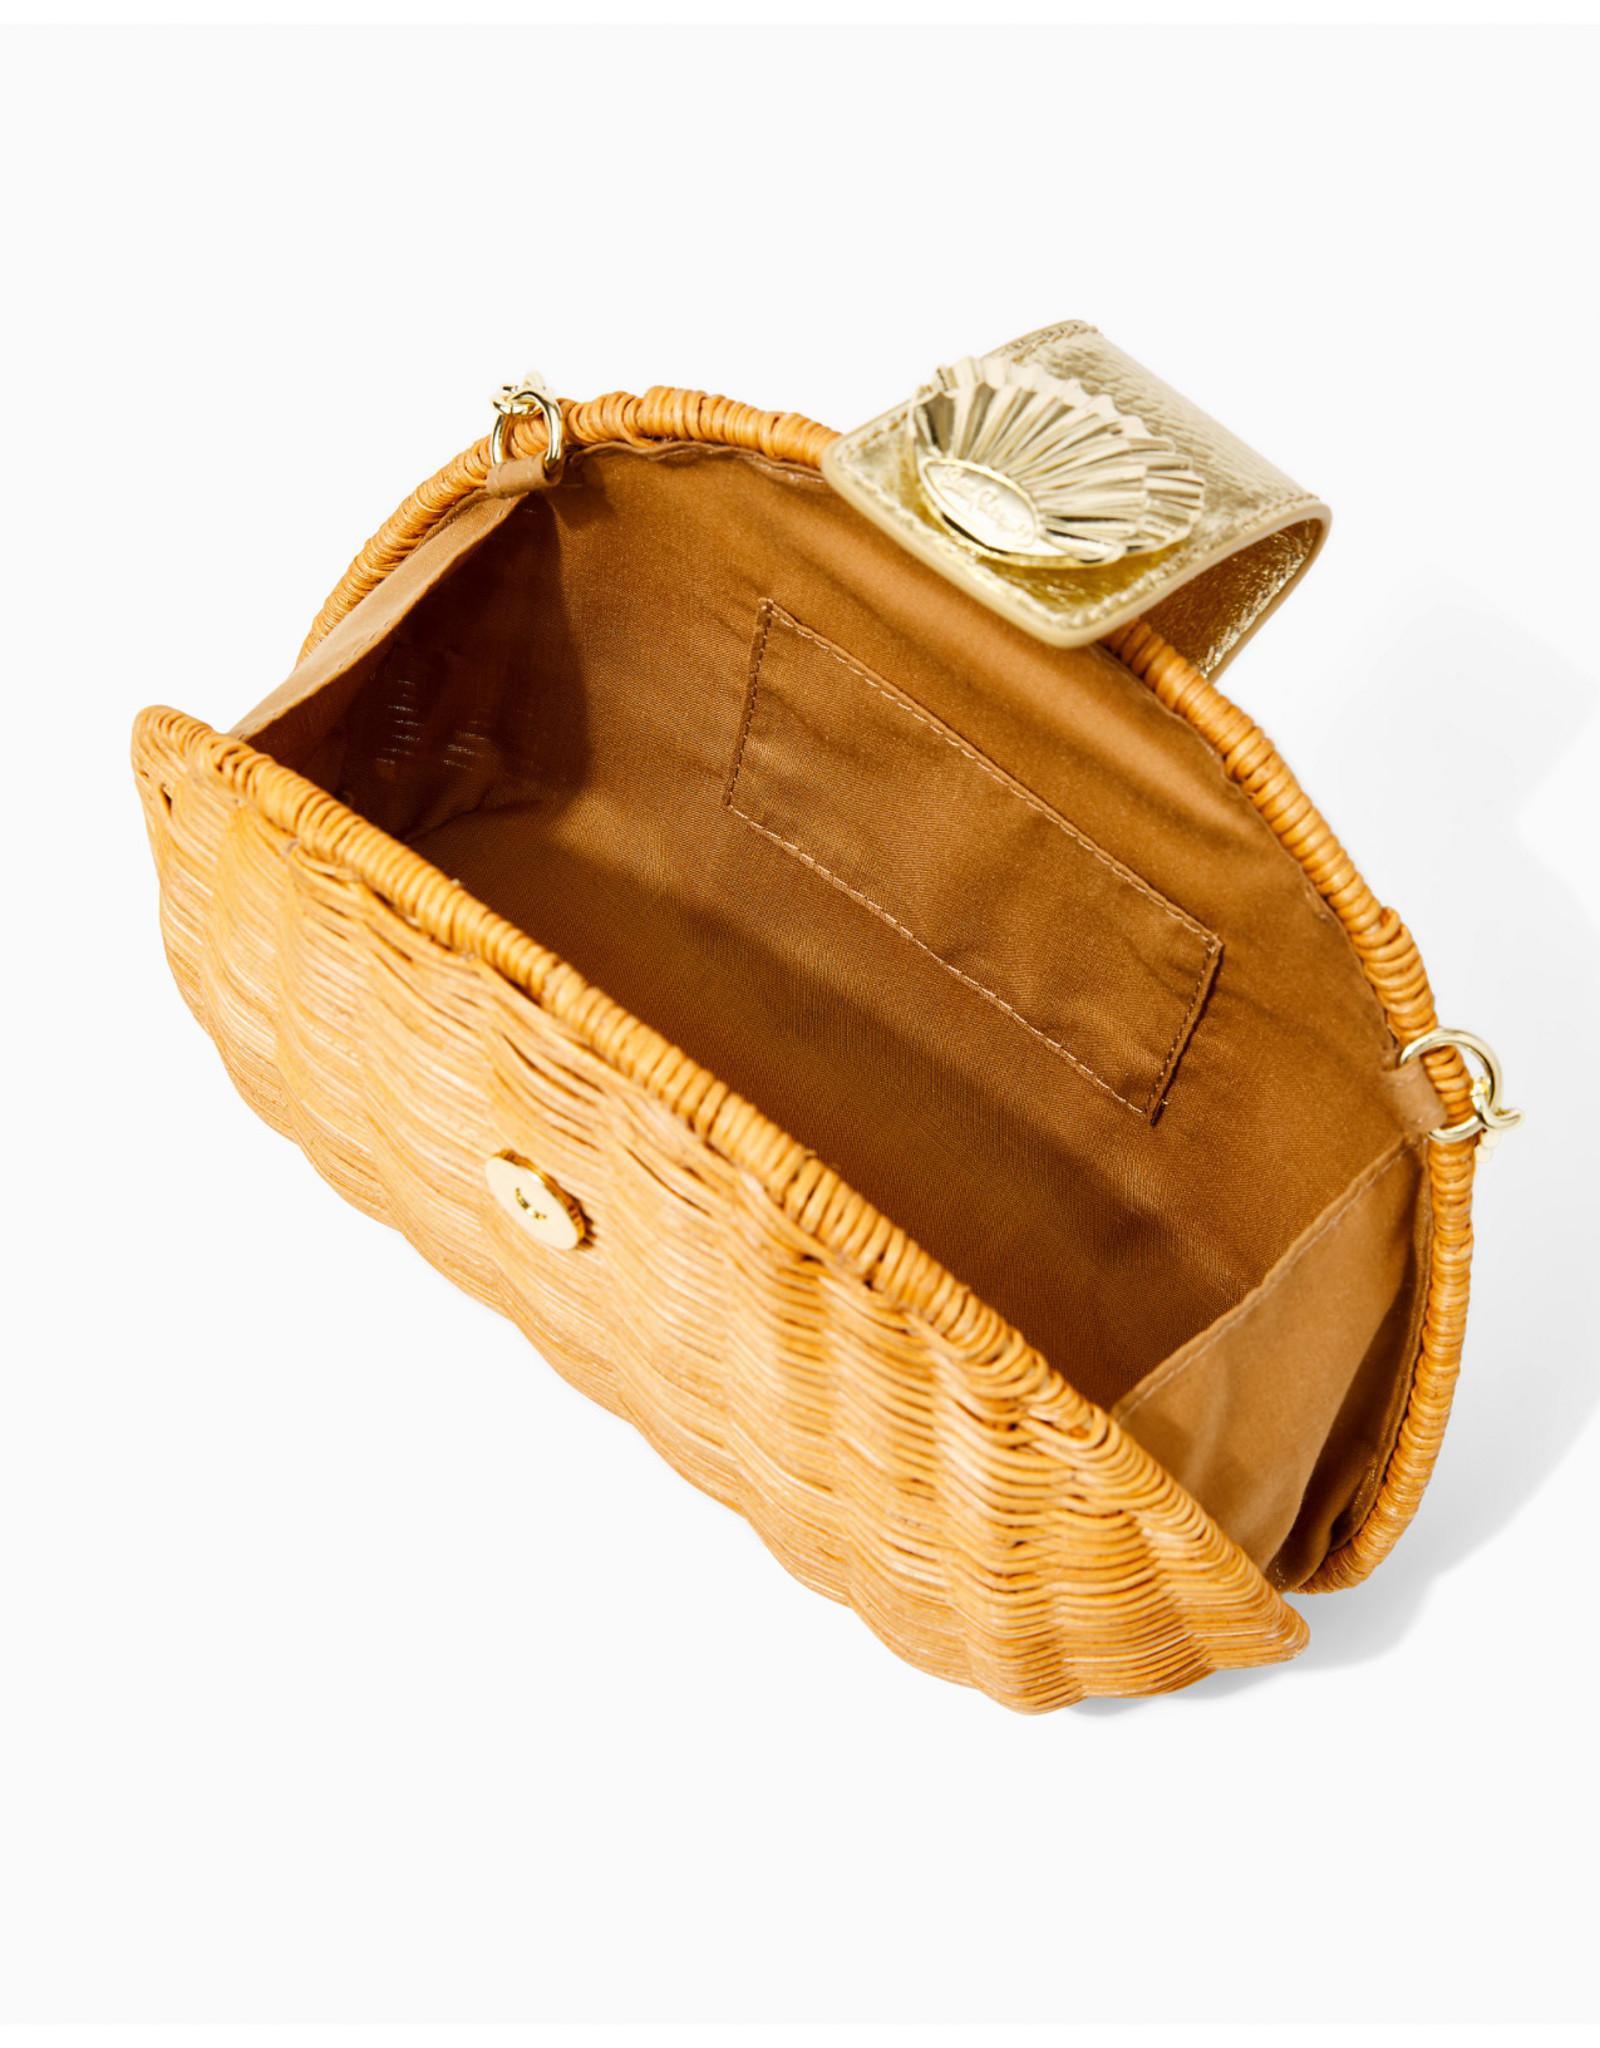 Lilly Pulitzer Redford Crossbody Bag